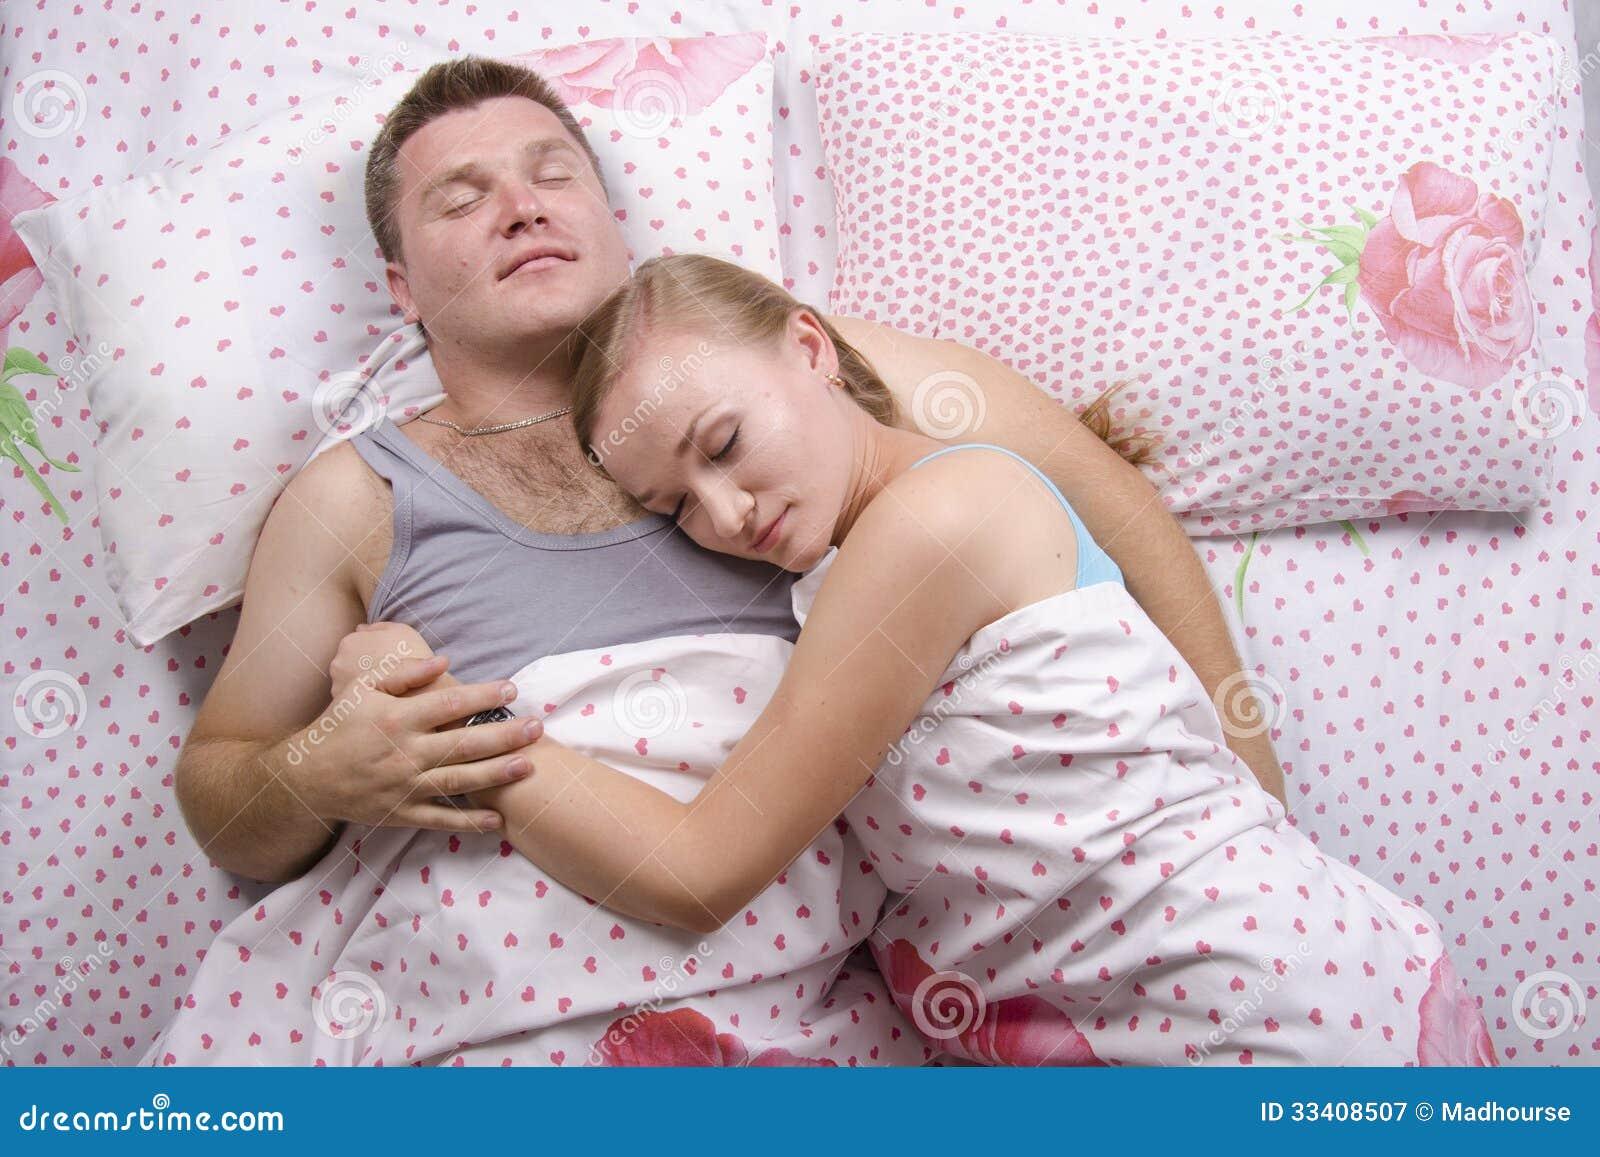 Мой брат меня во сне рассказ. трахнул порно